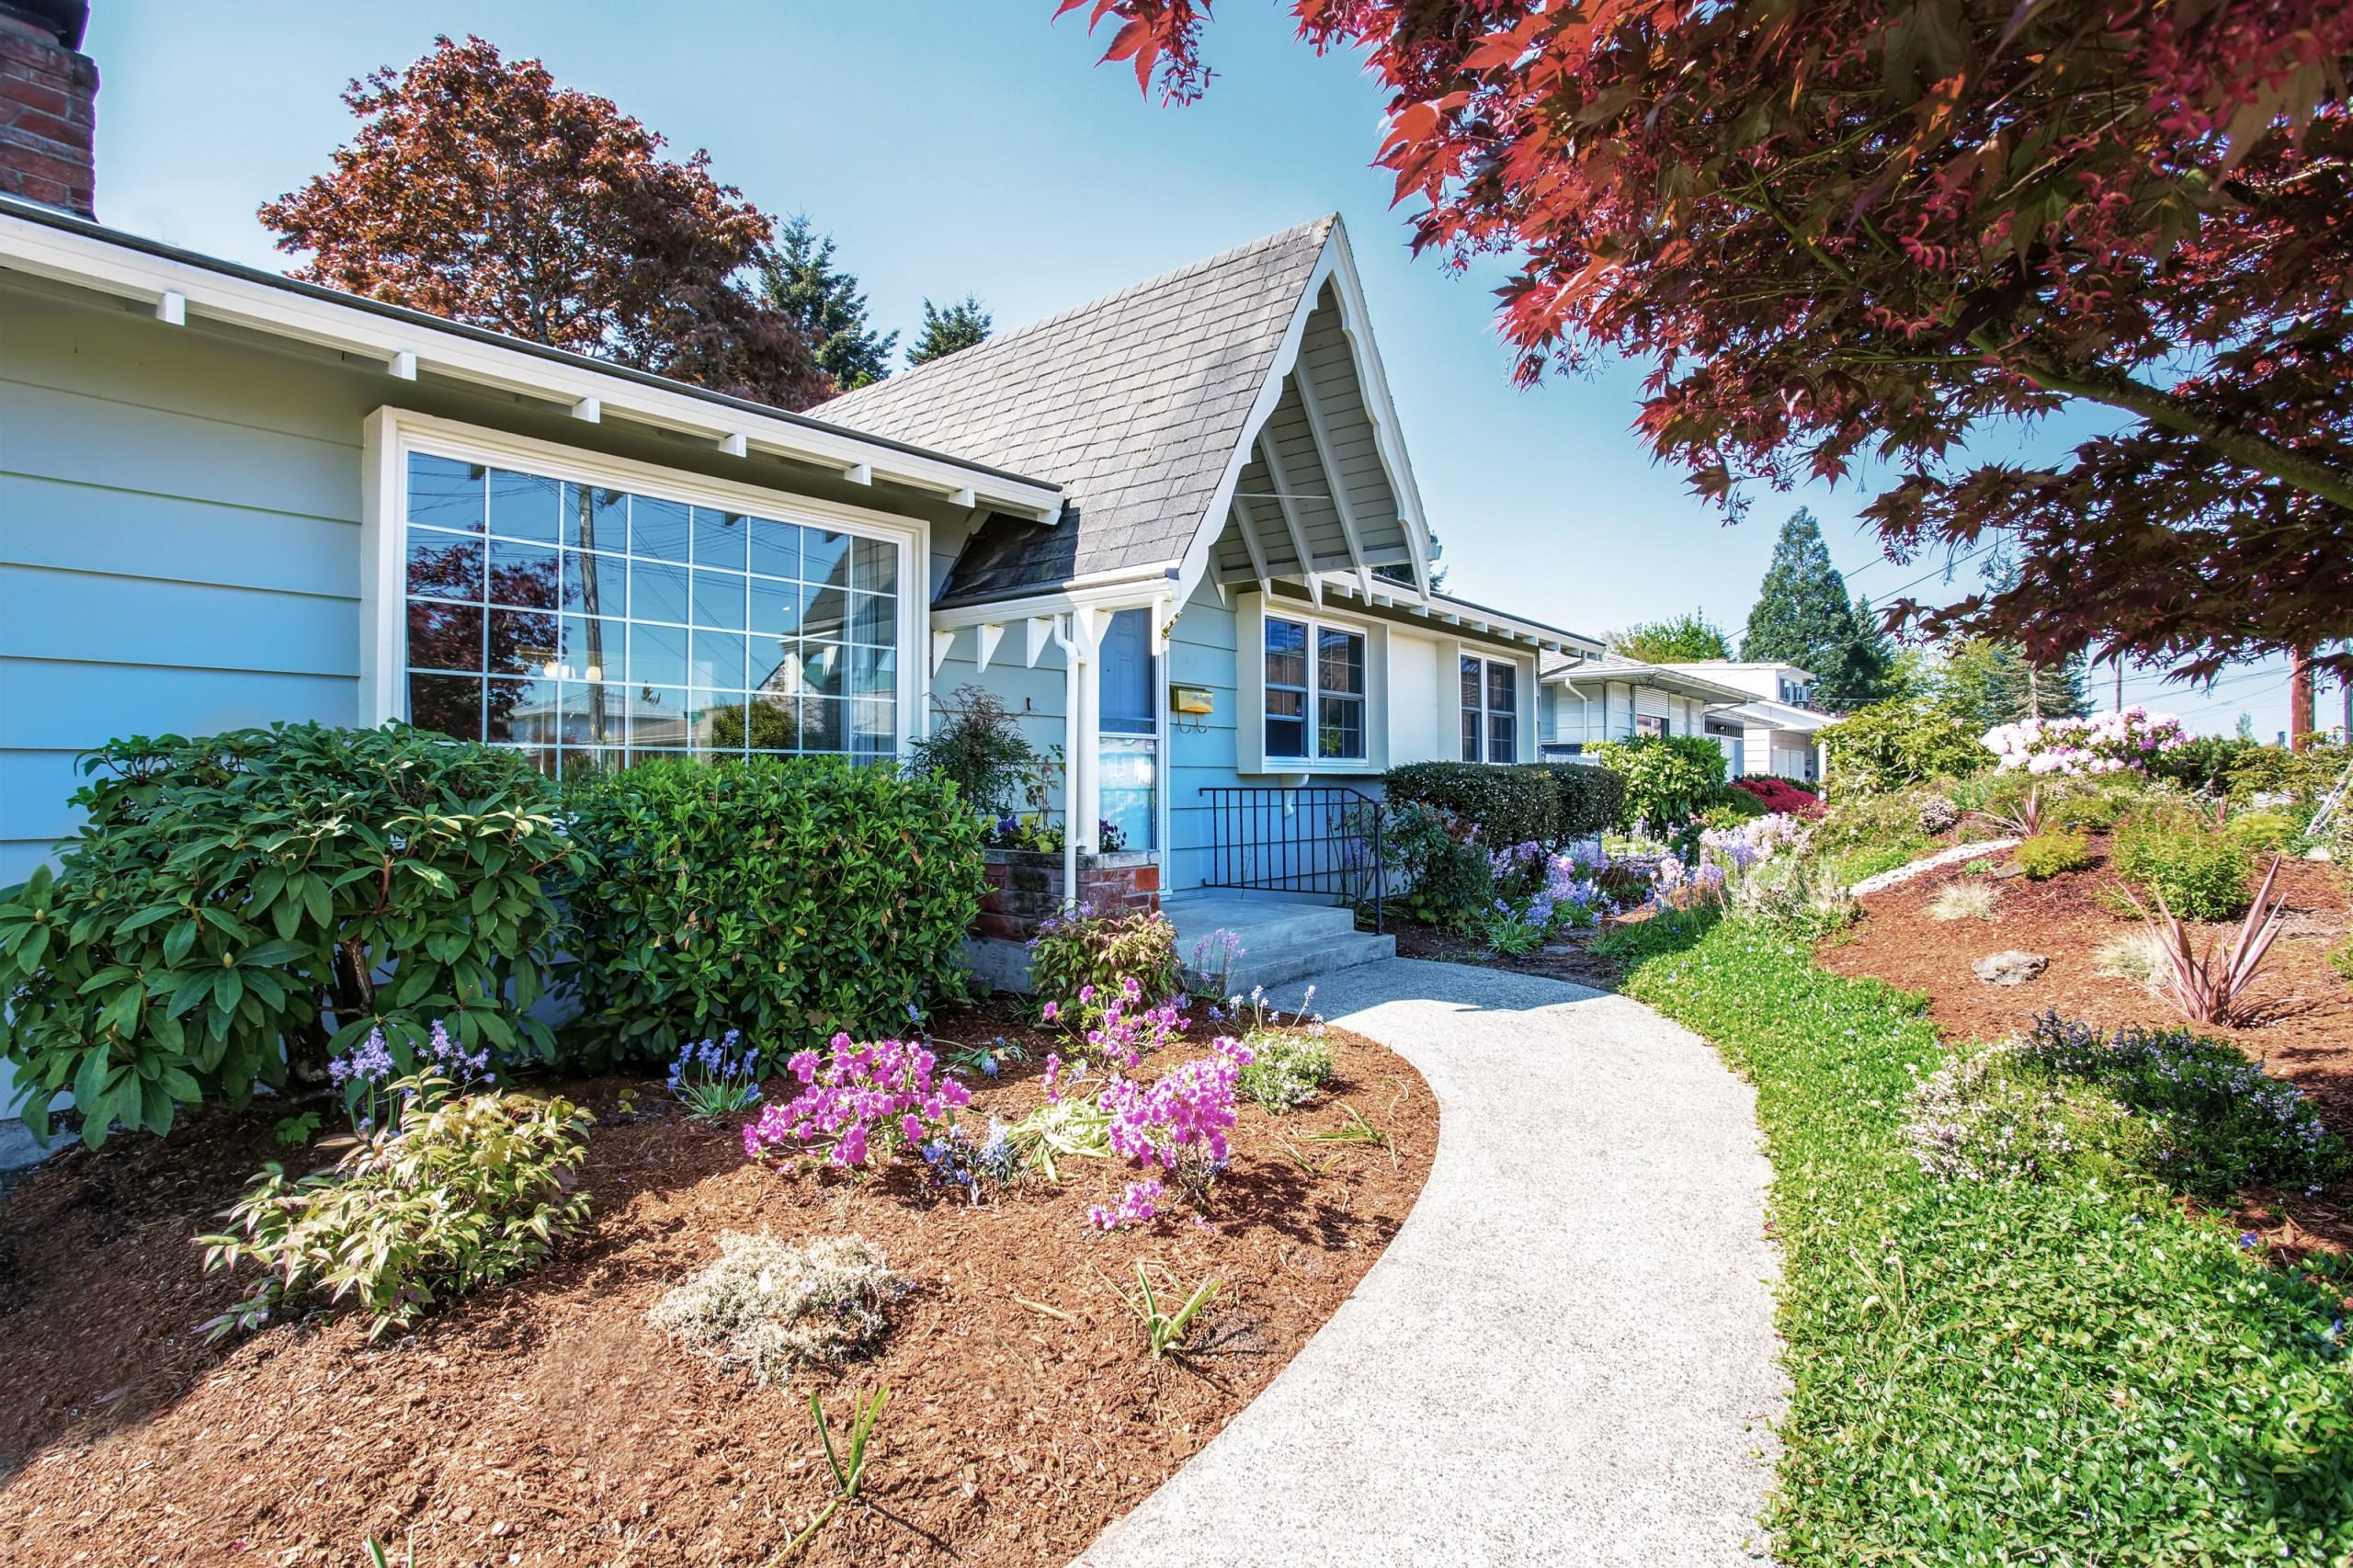 Exterior of suburban home